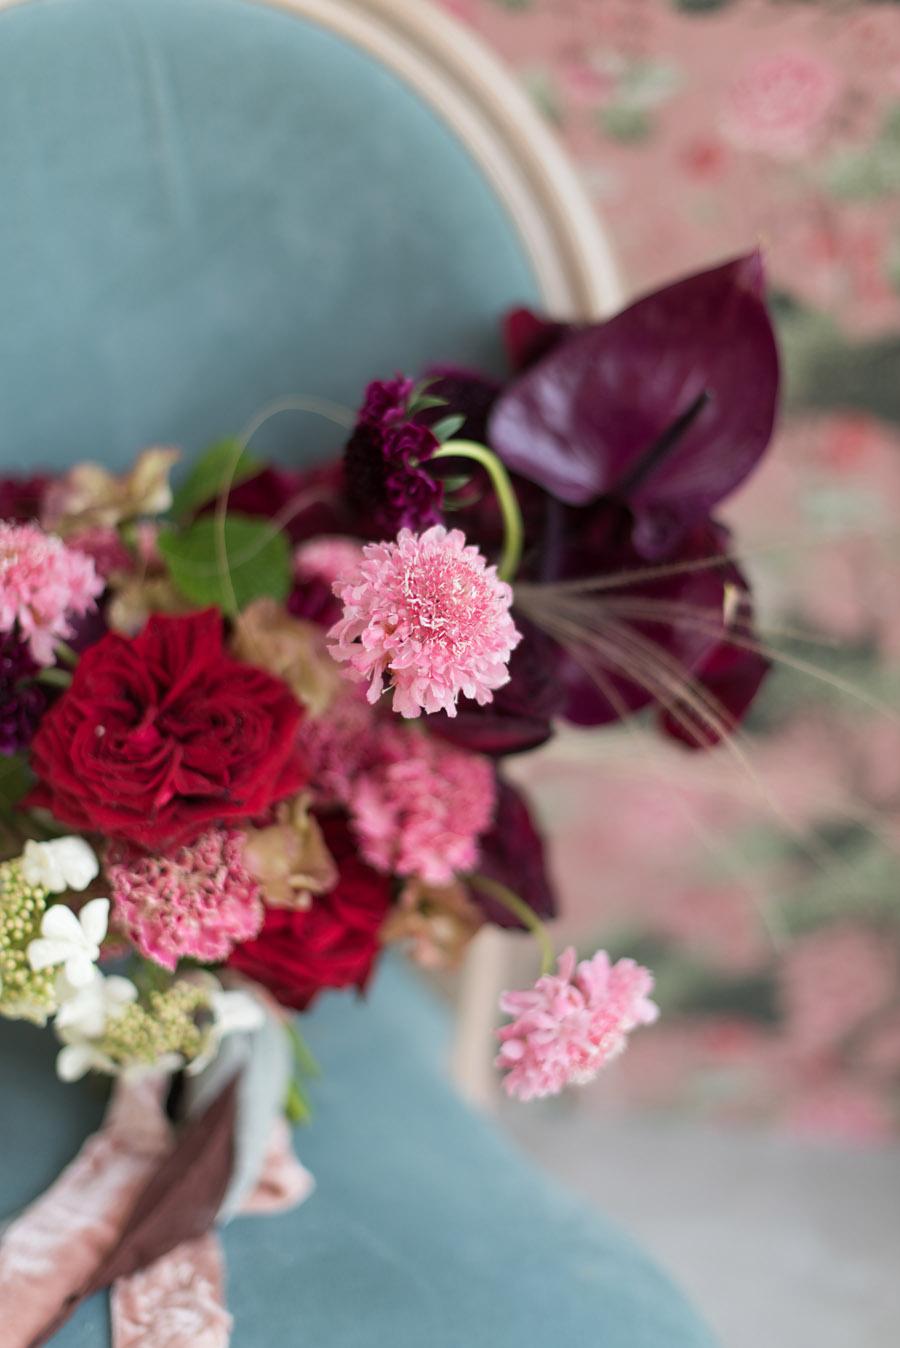 floral wedding ideas at Millbridge Court on English Wedding - photo credit Julie Michaelsen Photography (21)